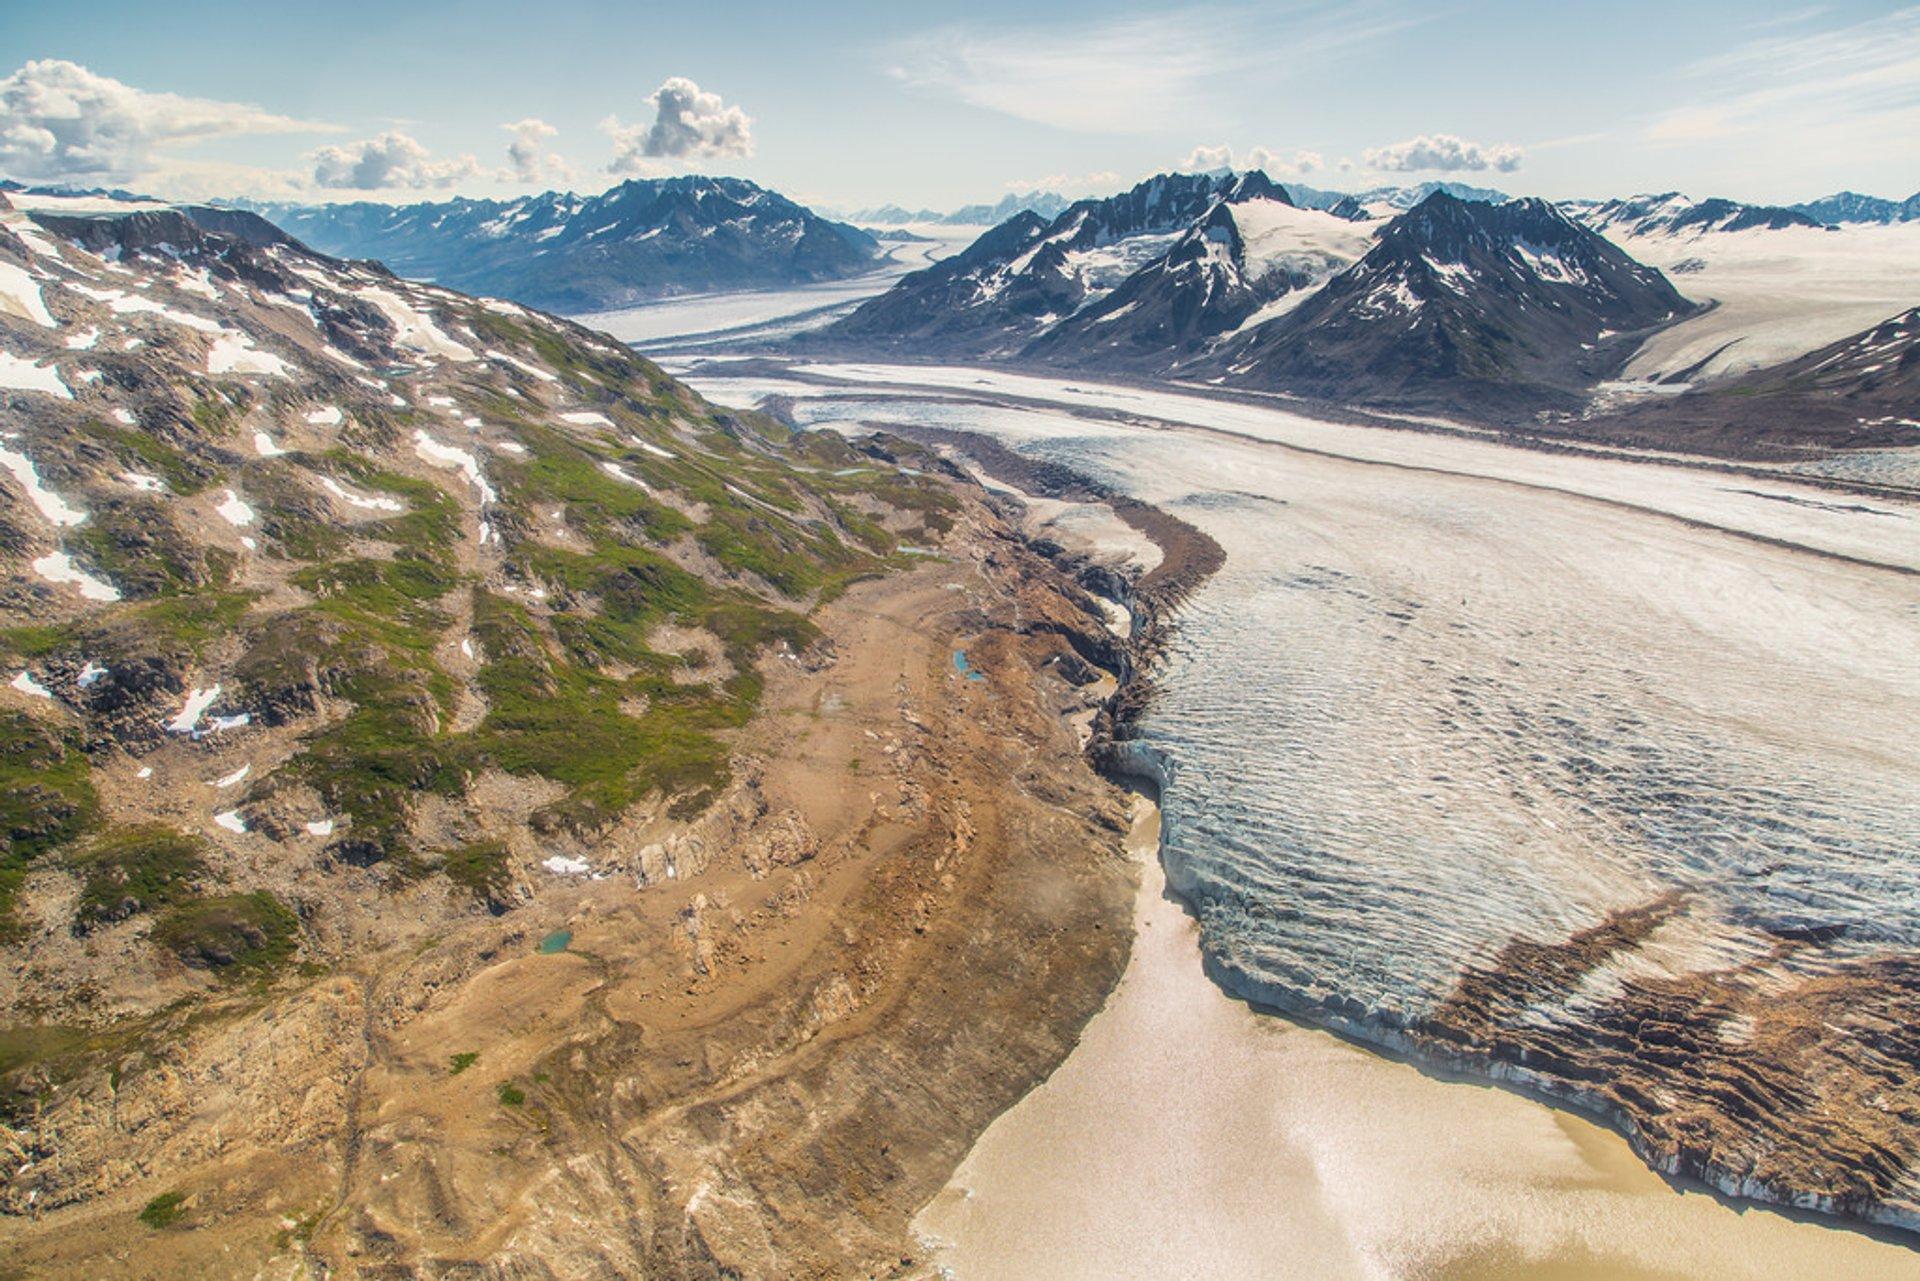 Tana Glacier 2019